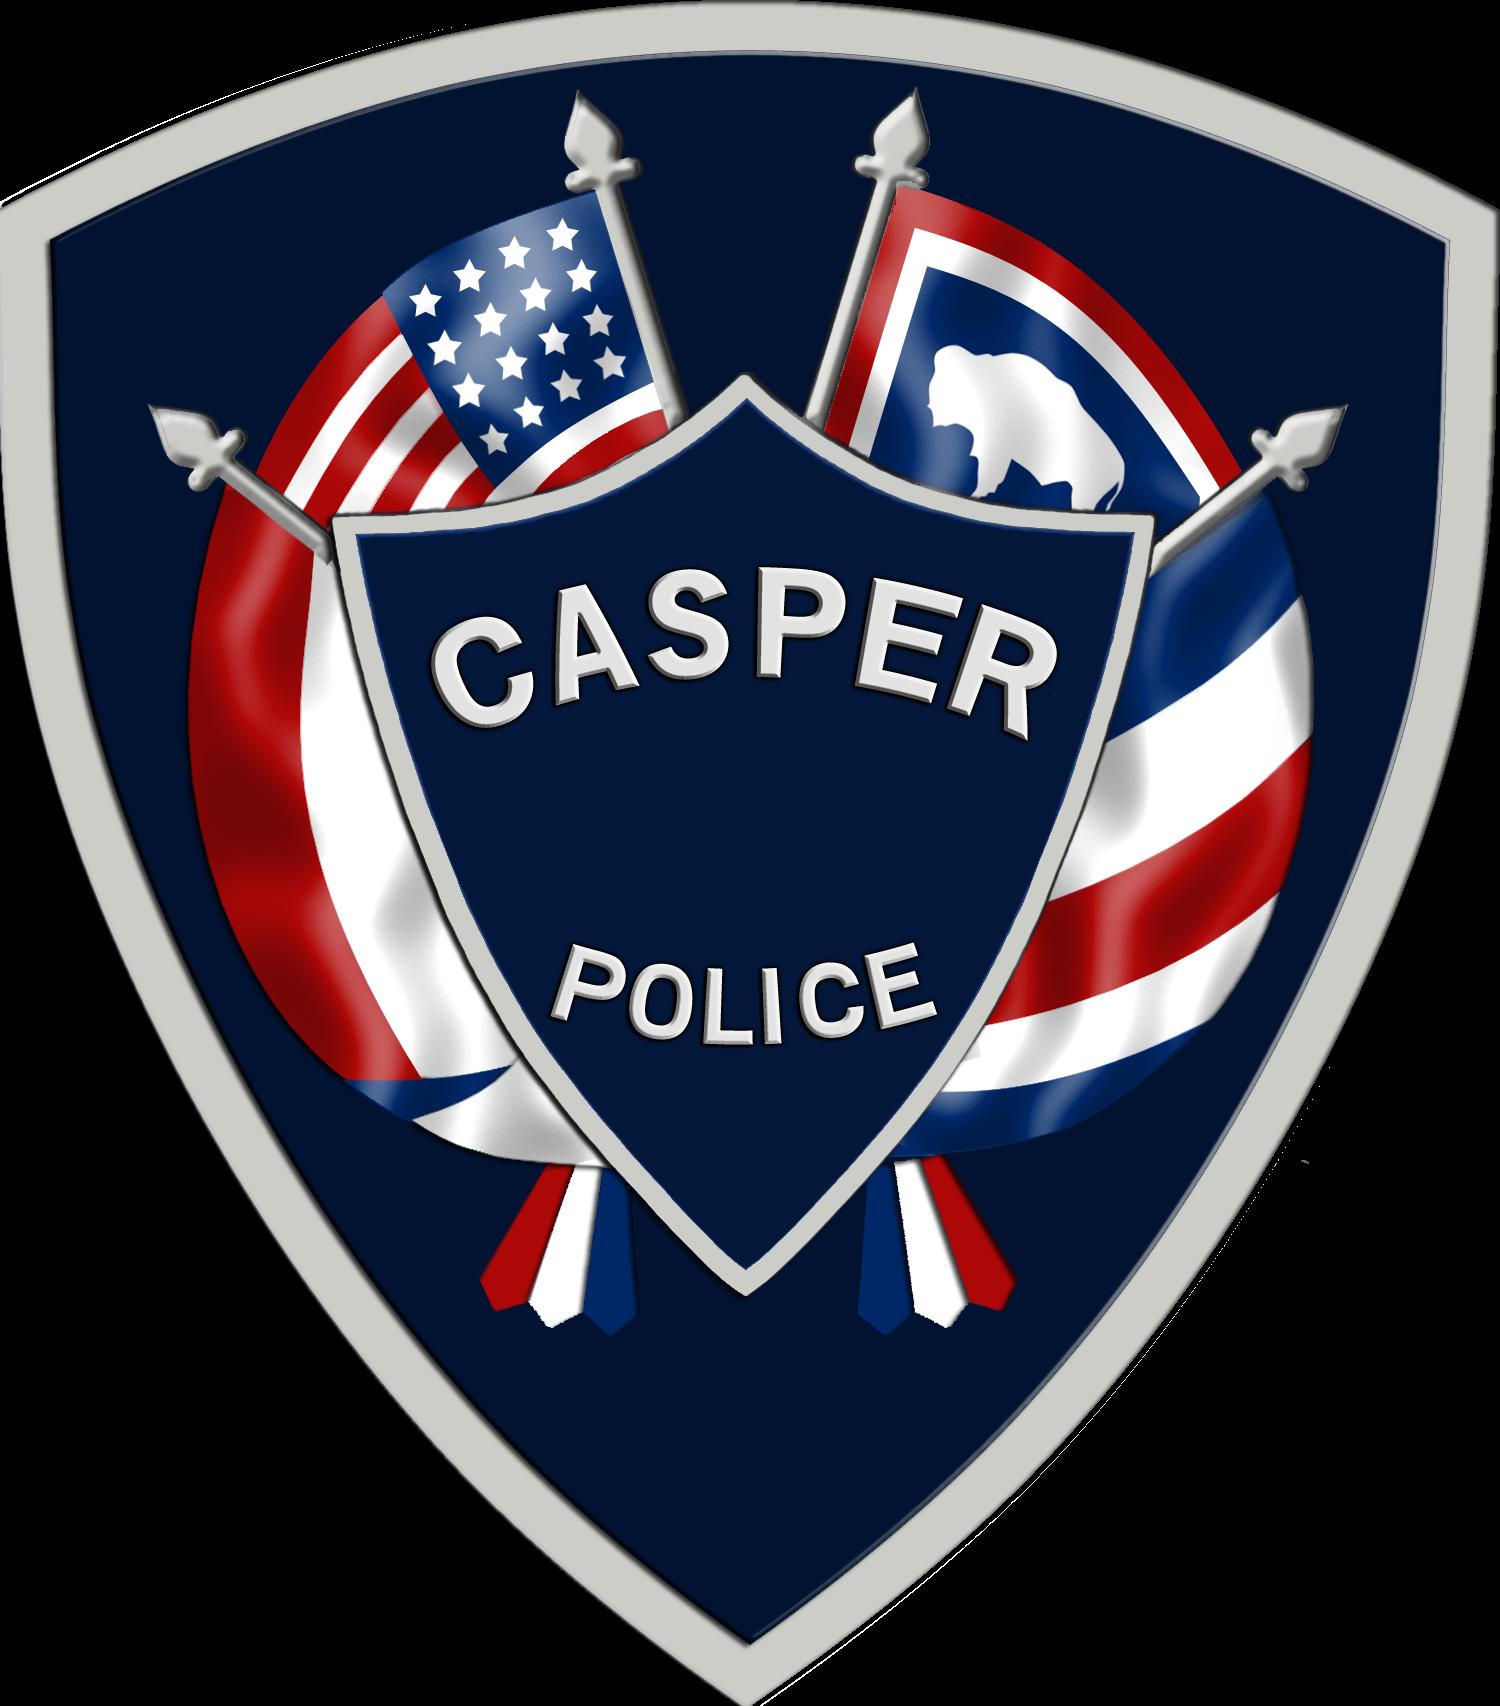 Casper Police Department